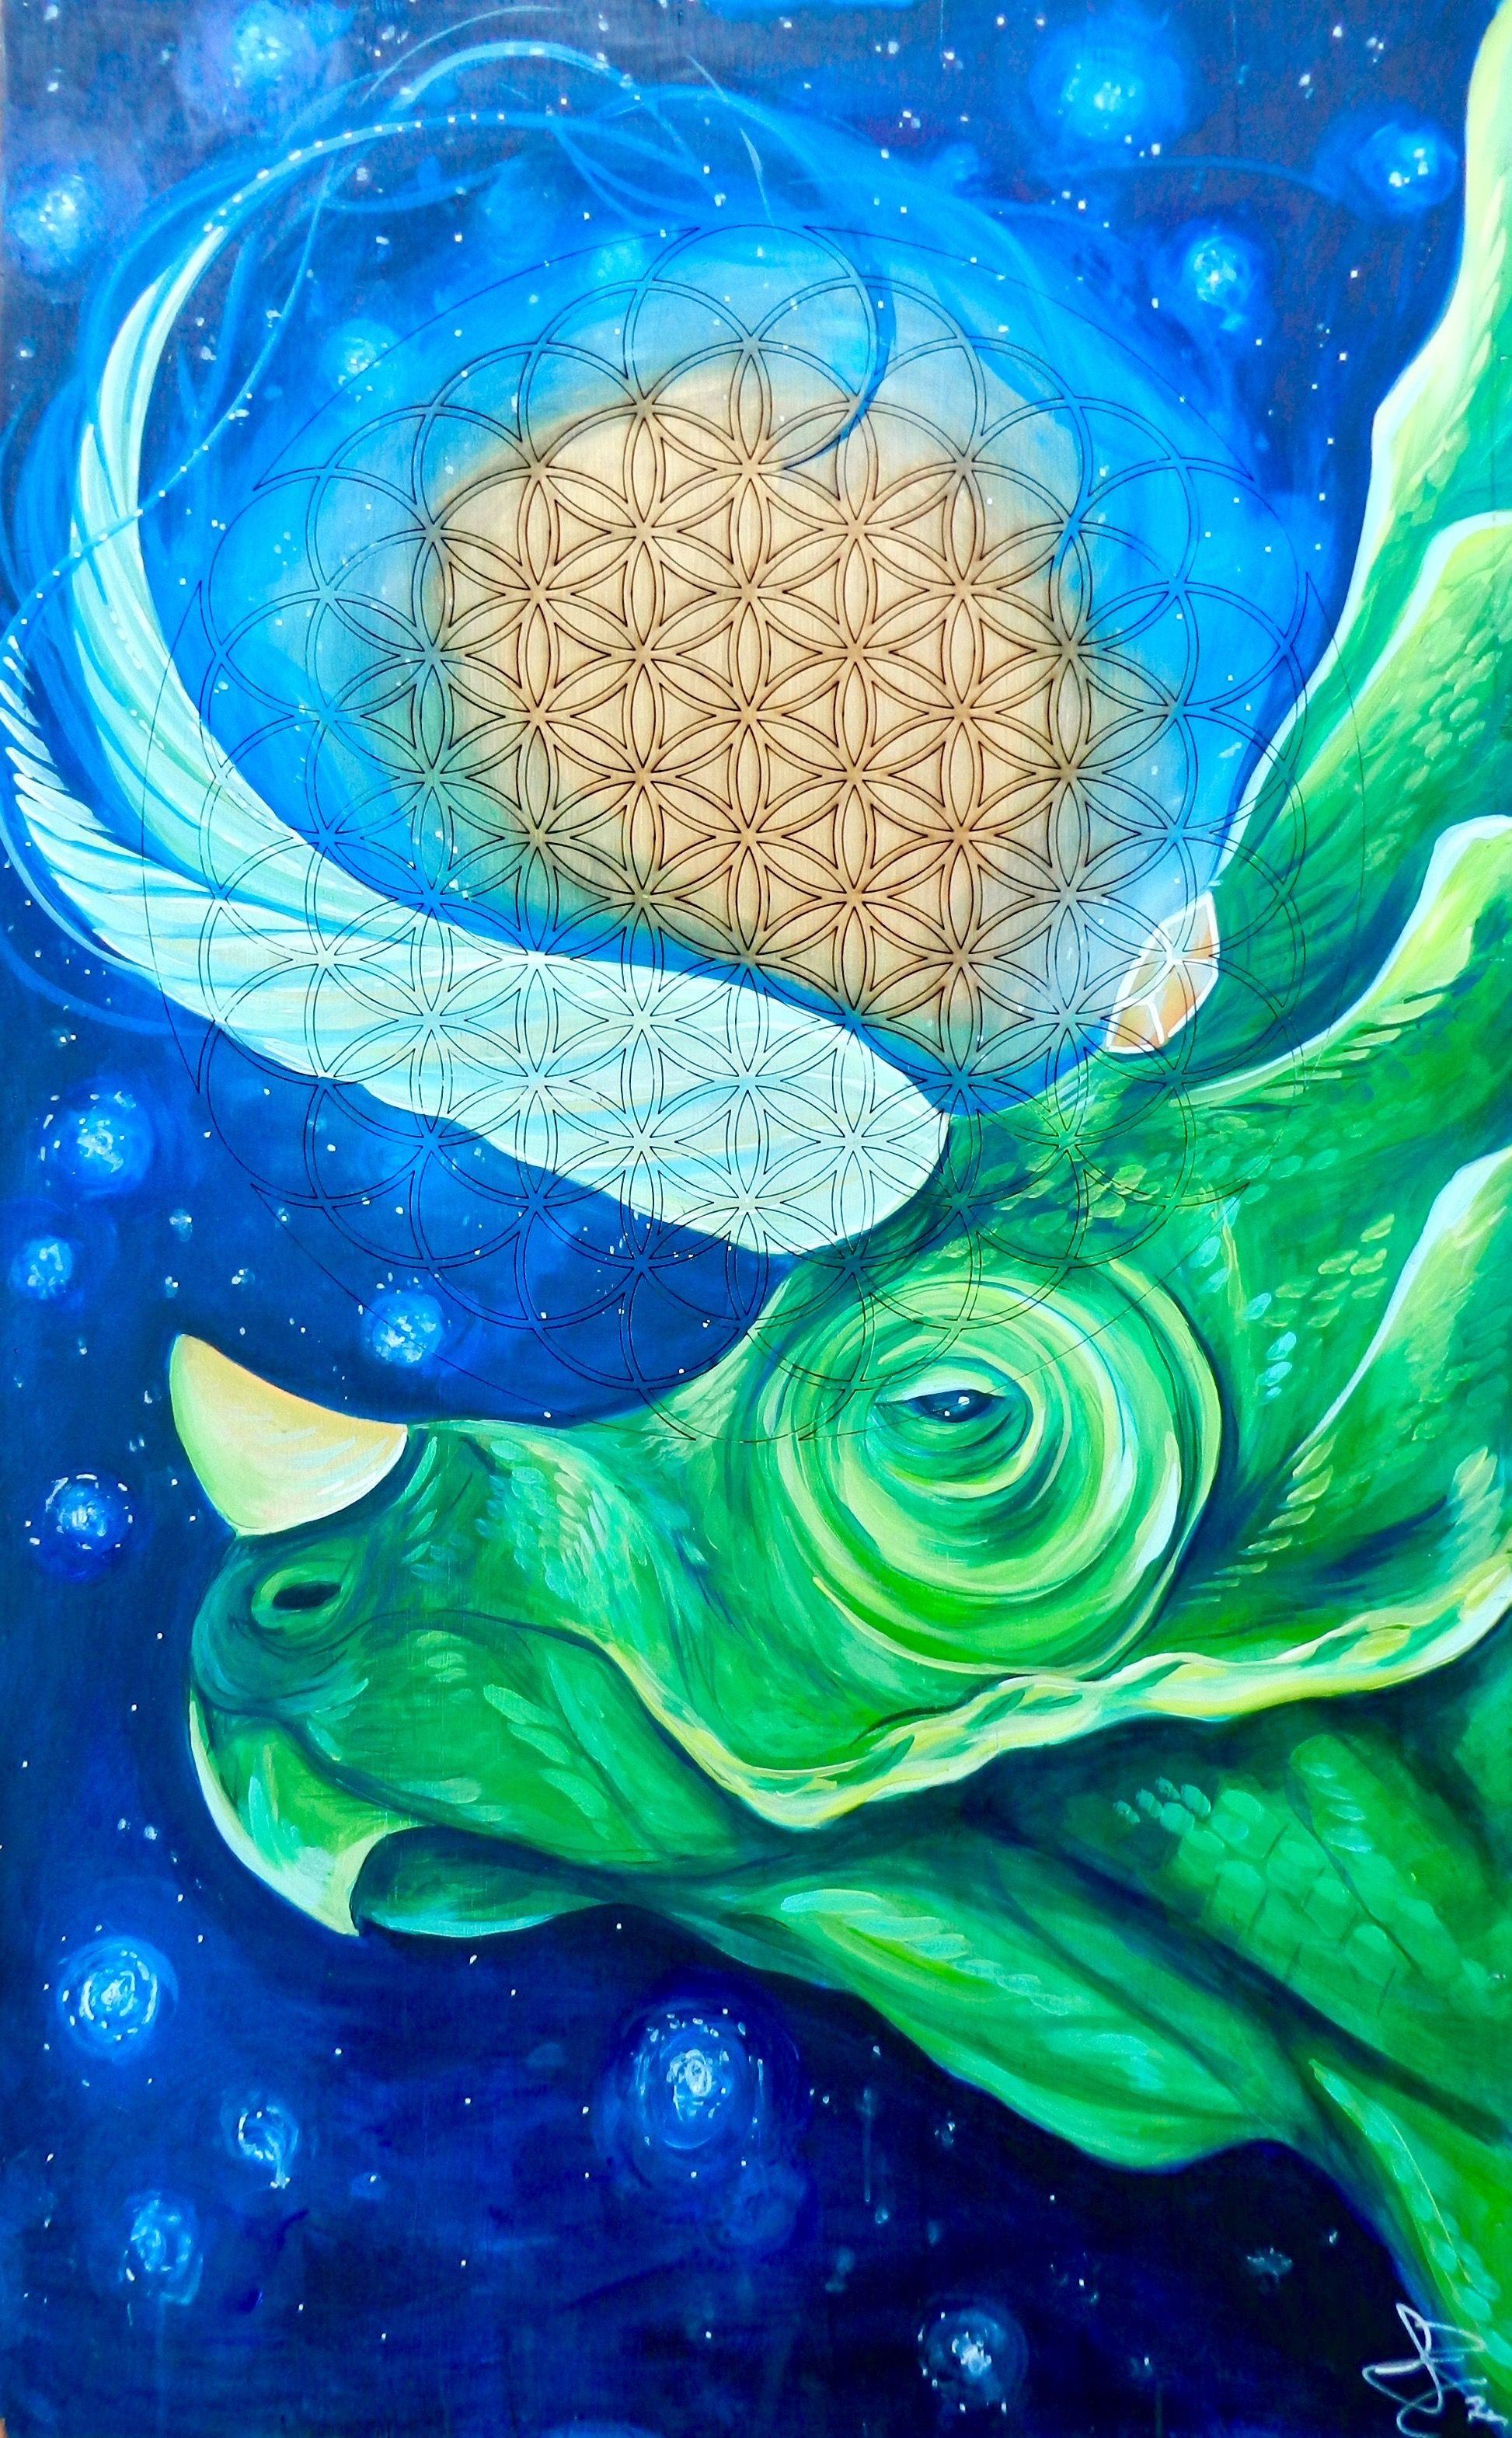 dinosaur ll triceratops ll sacred geometry ll universal ll  dinosaur ll triceratops ll sacred geometry ll universal ll visionary art ll skavenge art ll selena